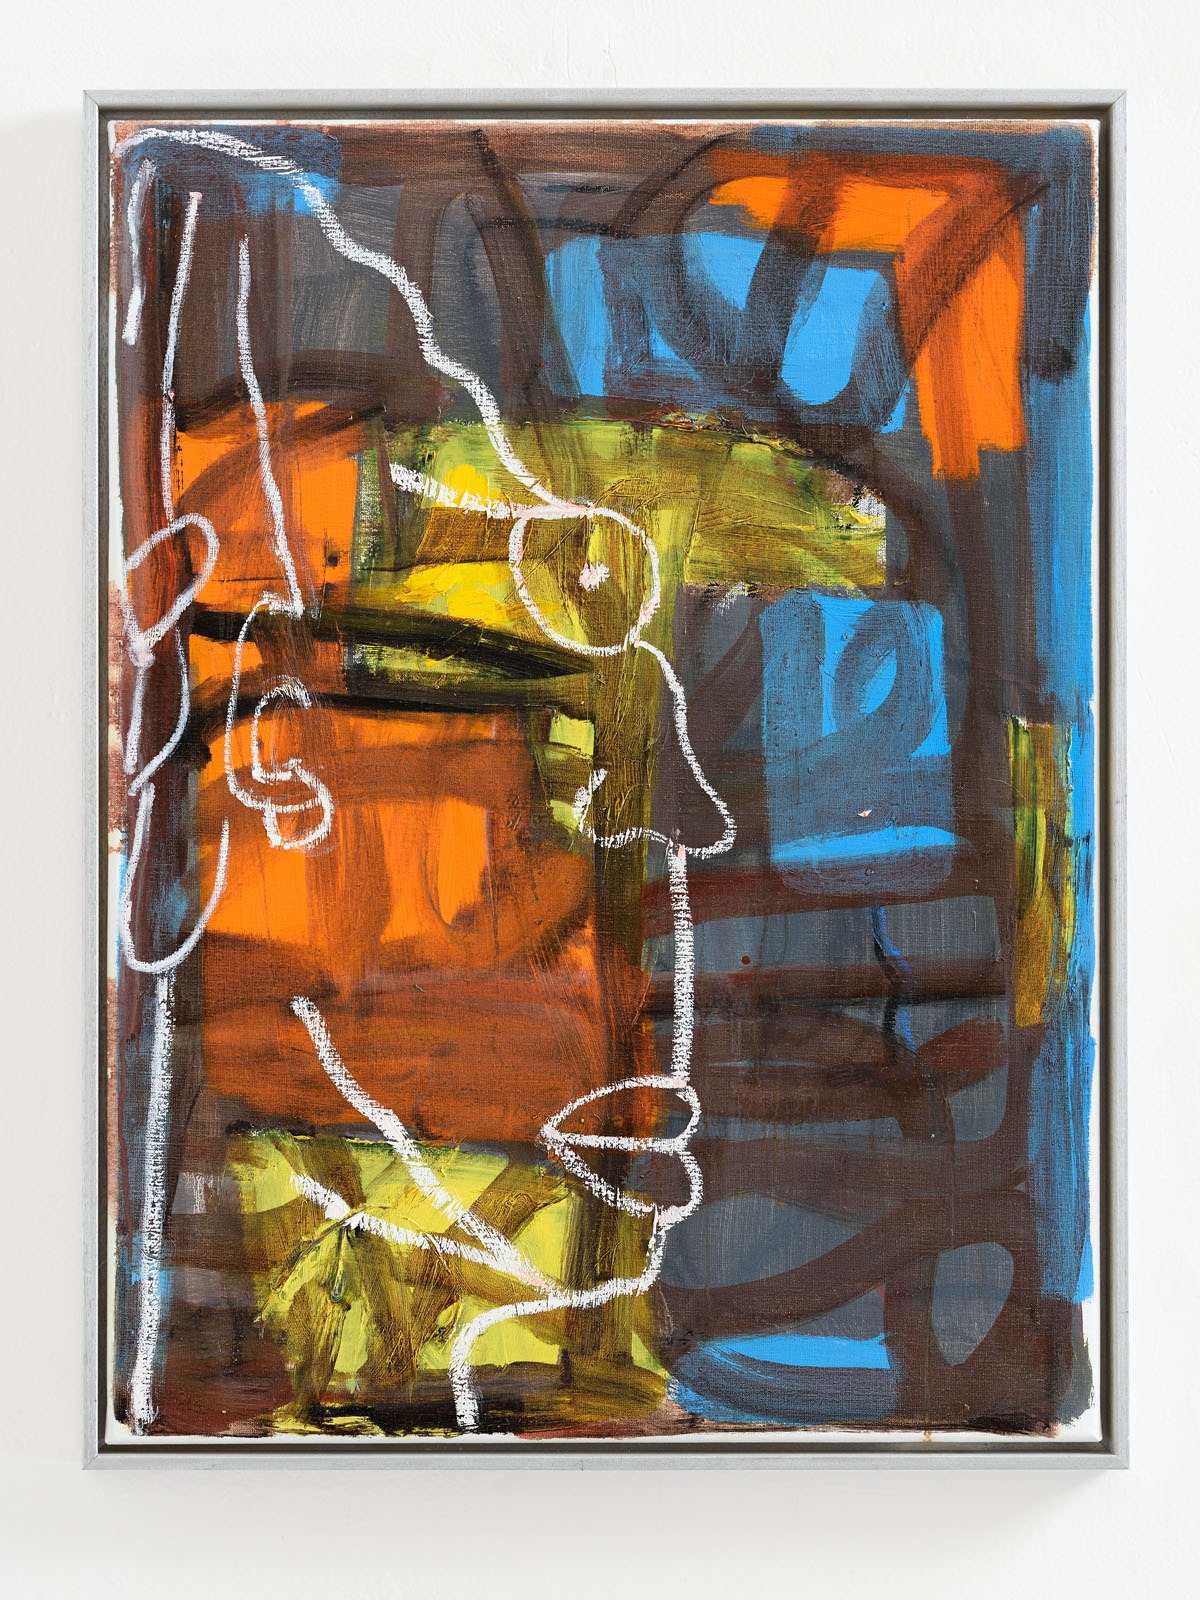 Martin Lukáč  Untitled , 2018, Oil and oil-stick on canvas, 80 x 60 cm